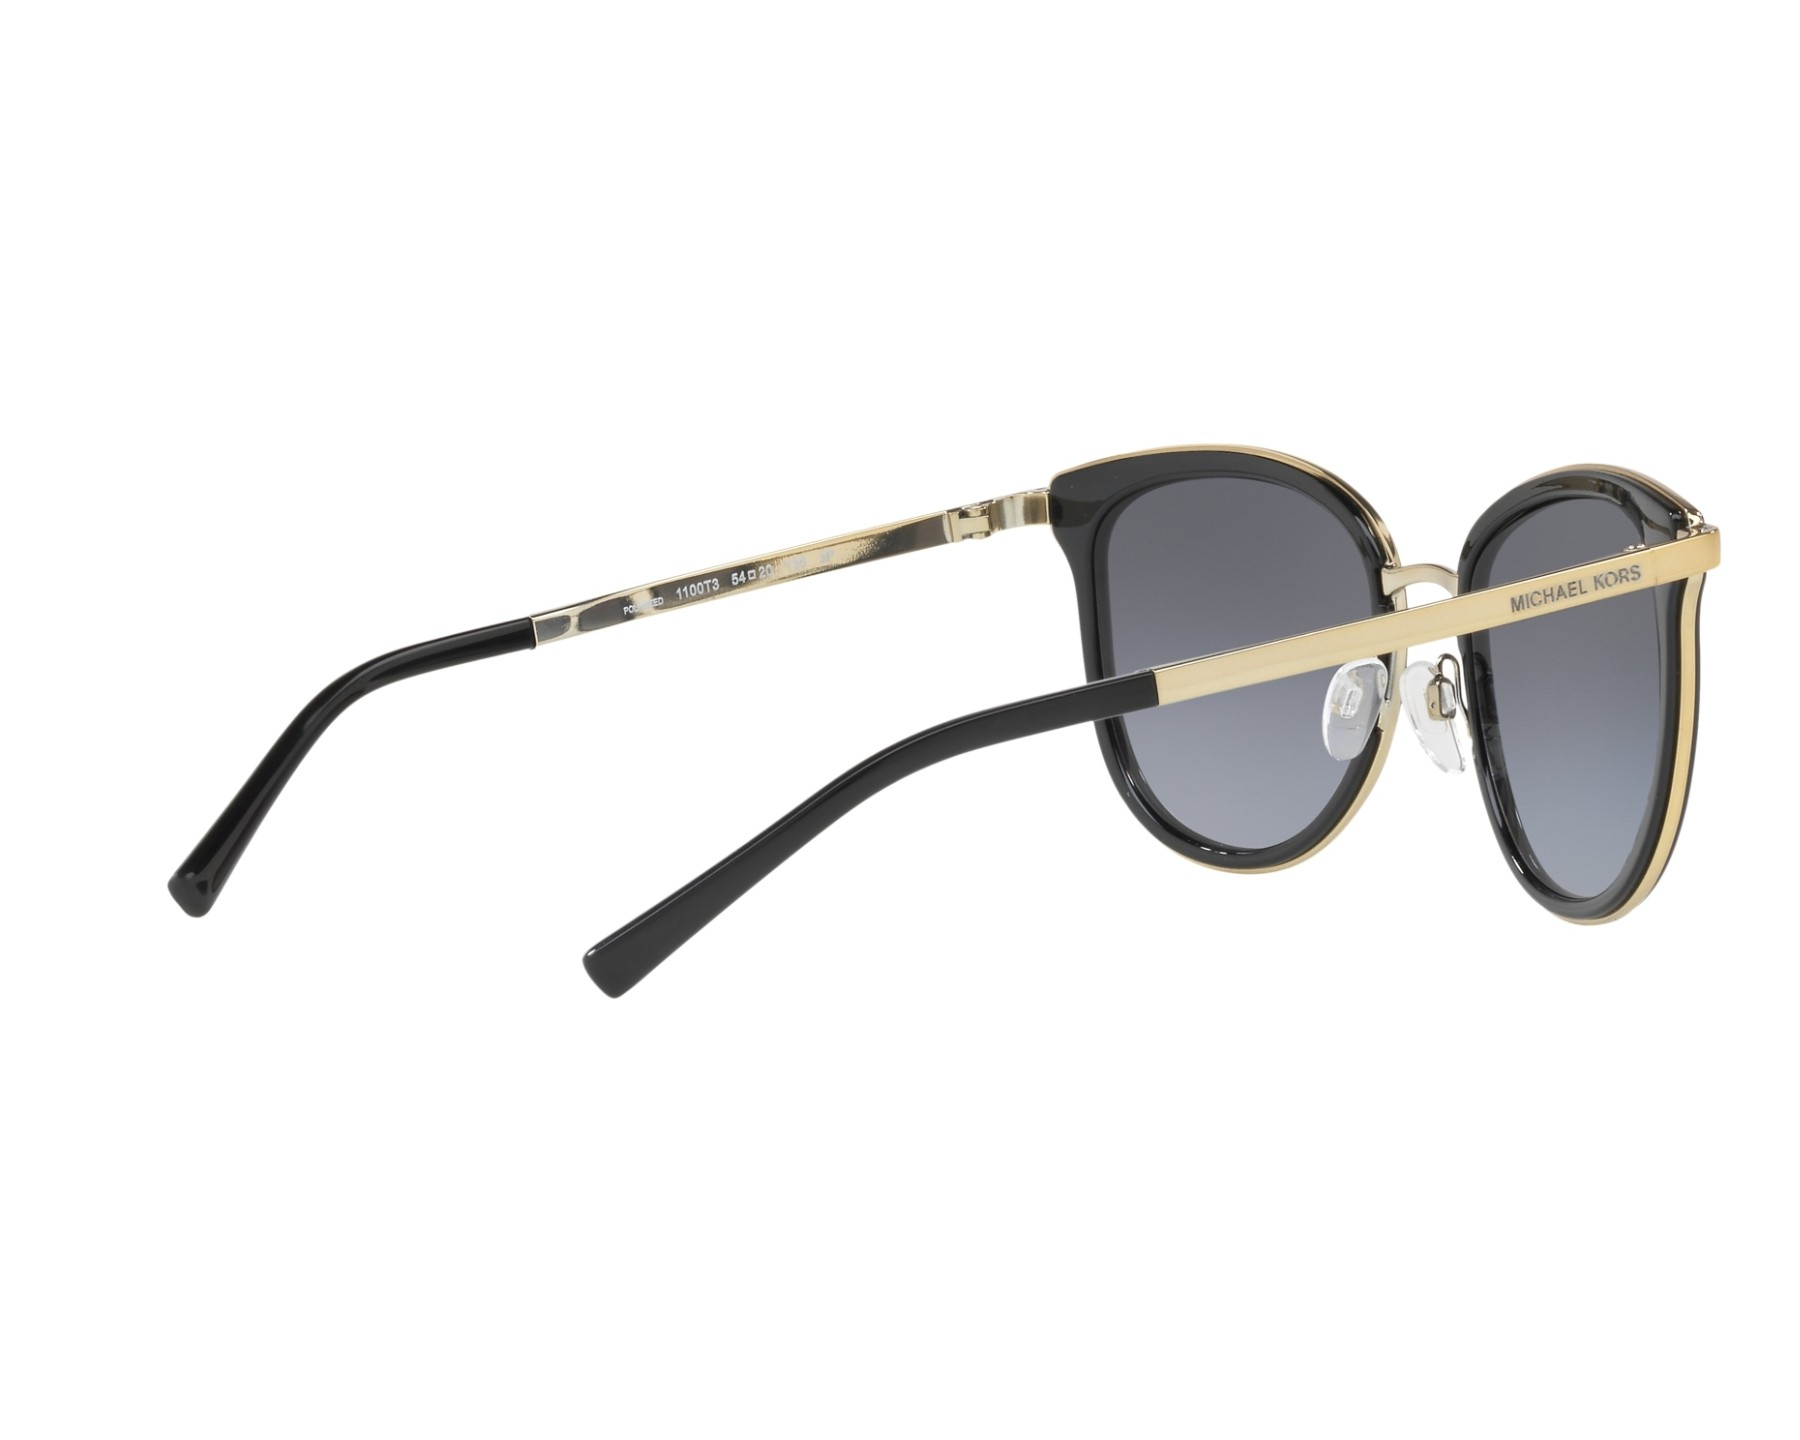 9a1ace97b6fd9 Sunglasses Michael Kors MK-1010 1100T3 54-20 Black Gold 360 degree view 9